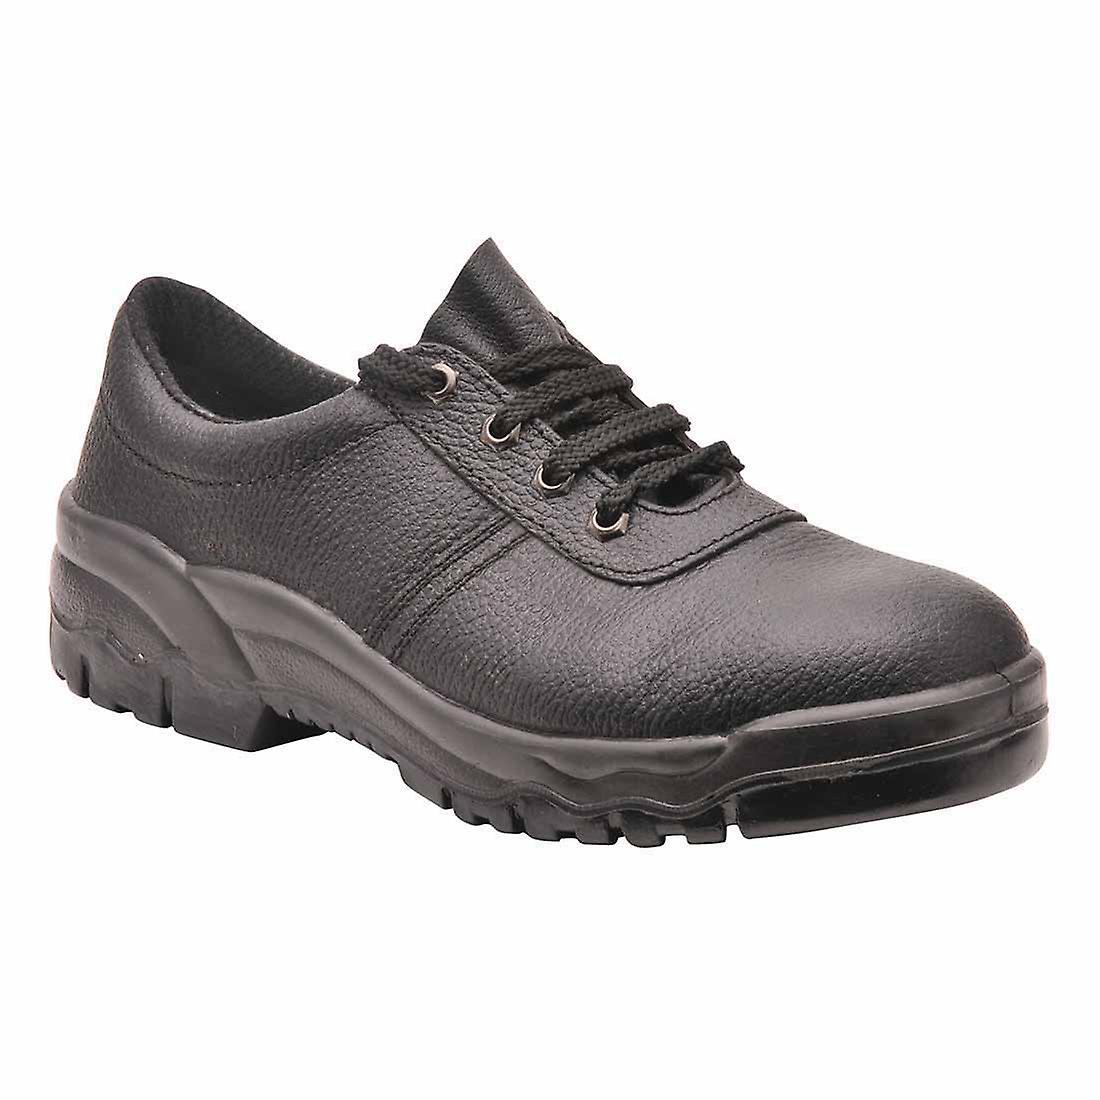 sUw - Steelite Protector Workwear Safety Shoe S1P